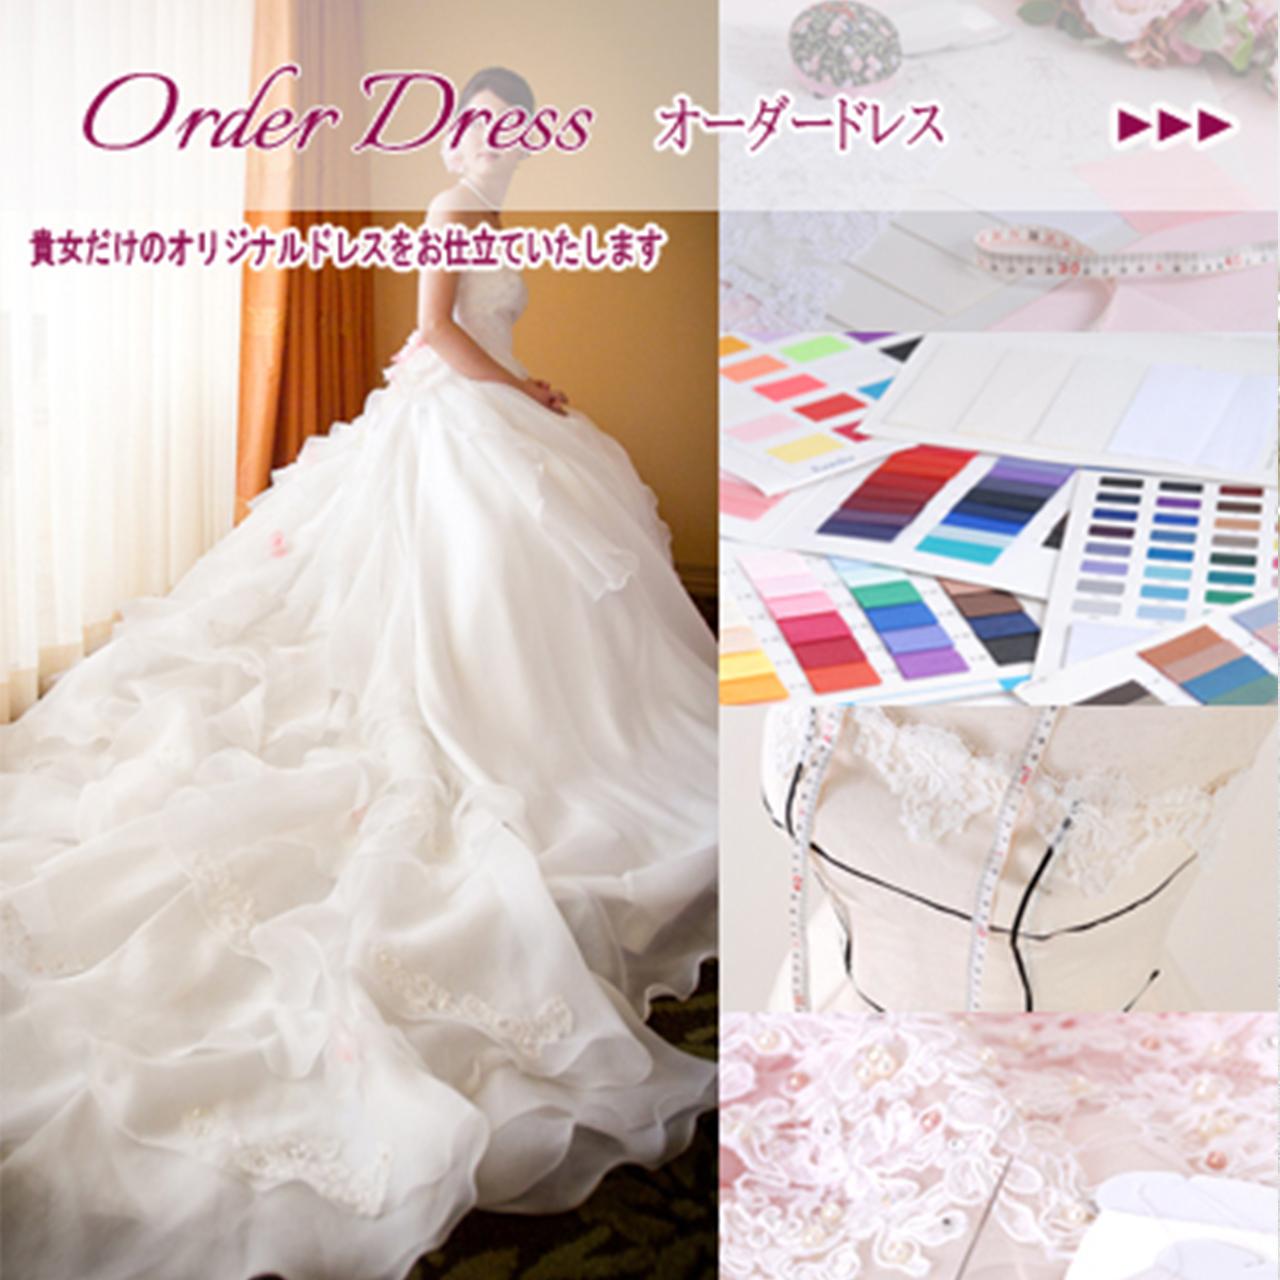 orderdress-image